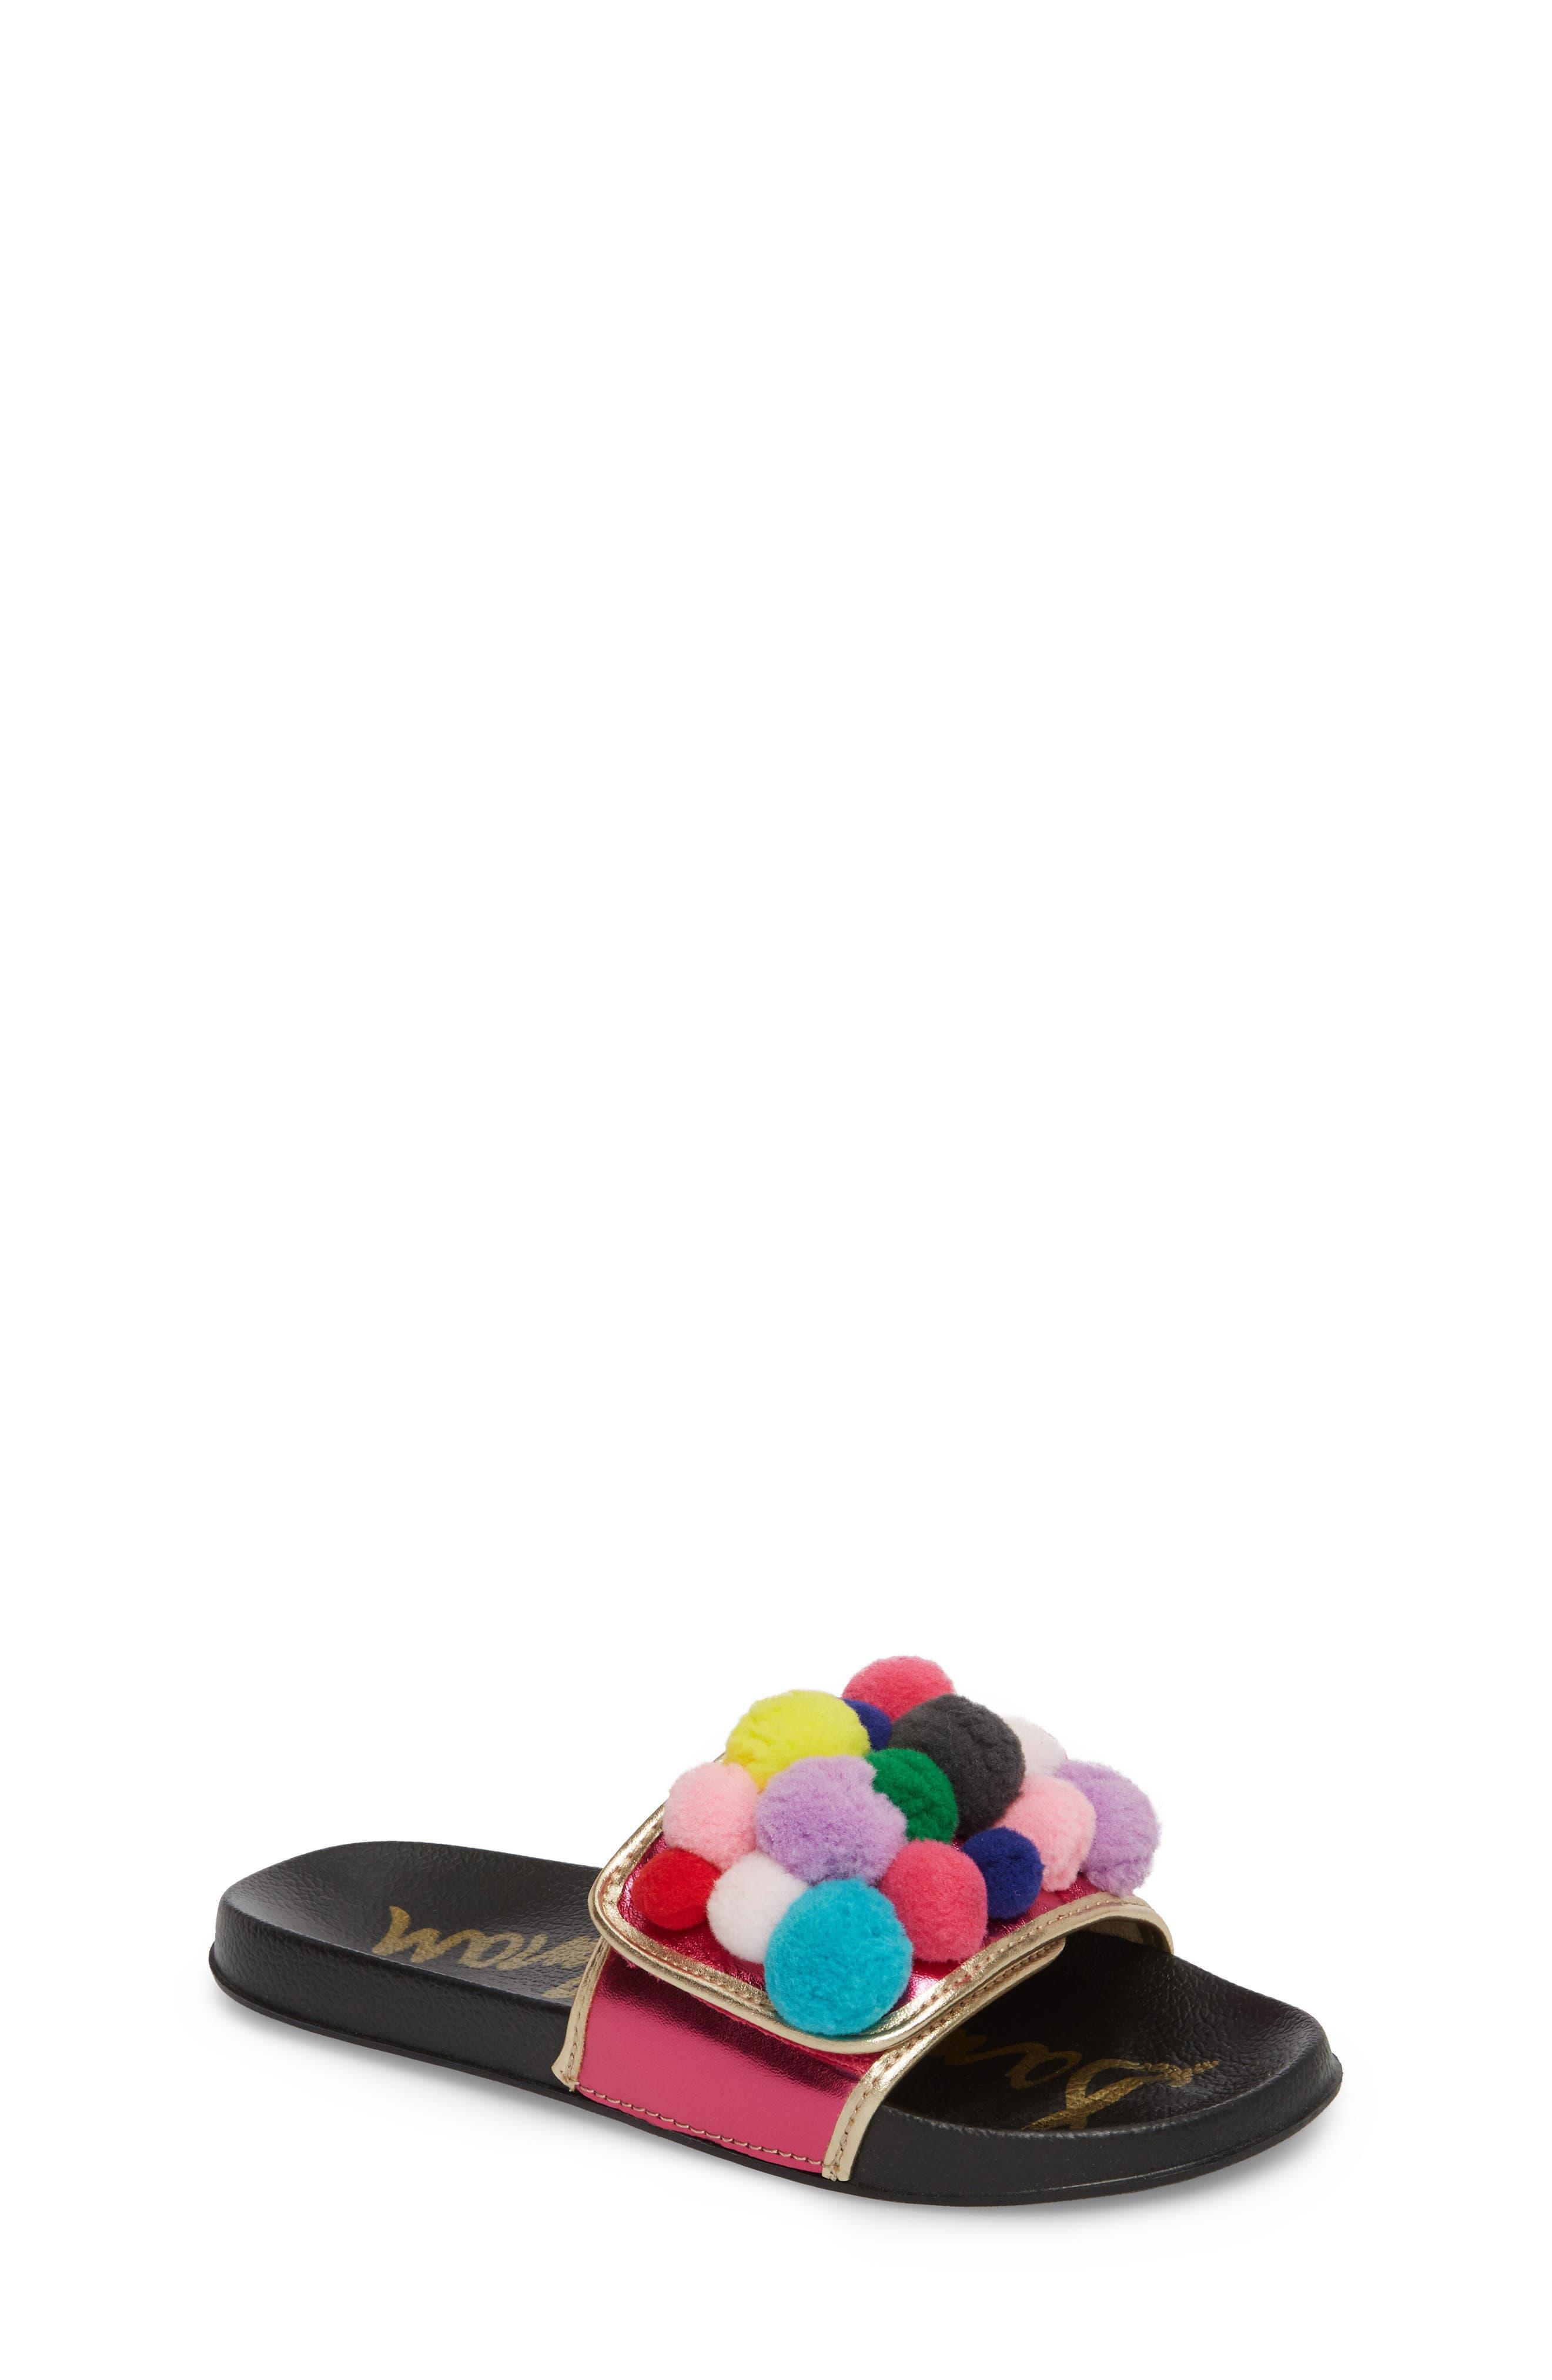 Faux Fur Mackie Cayman Sandal,                             Main thumbnail 1, color,                             Hot Pink Multi